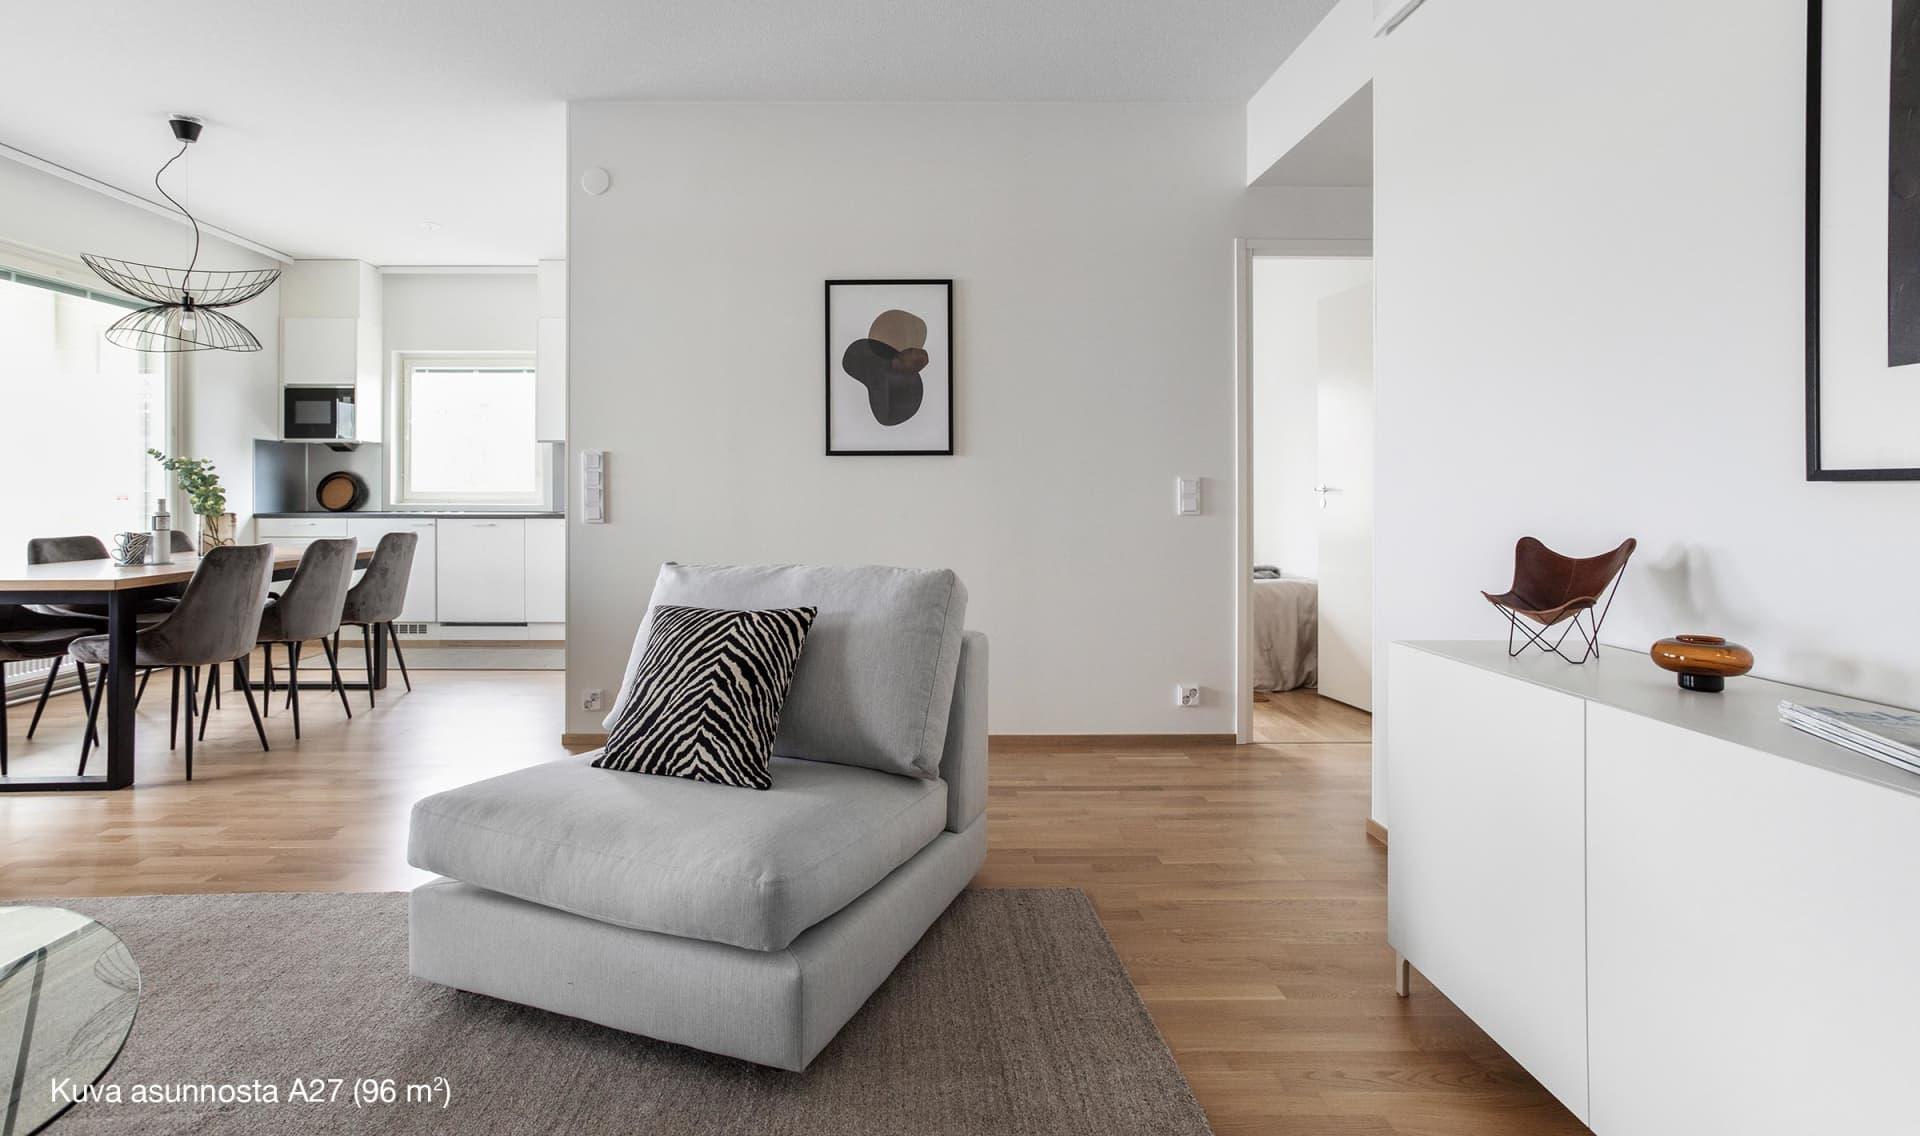 Asunto Oy Lahden Rantakukka - A27, 4h+kt+s, 96 m2